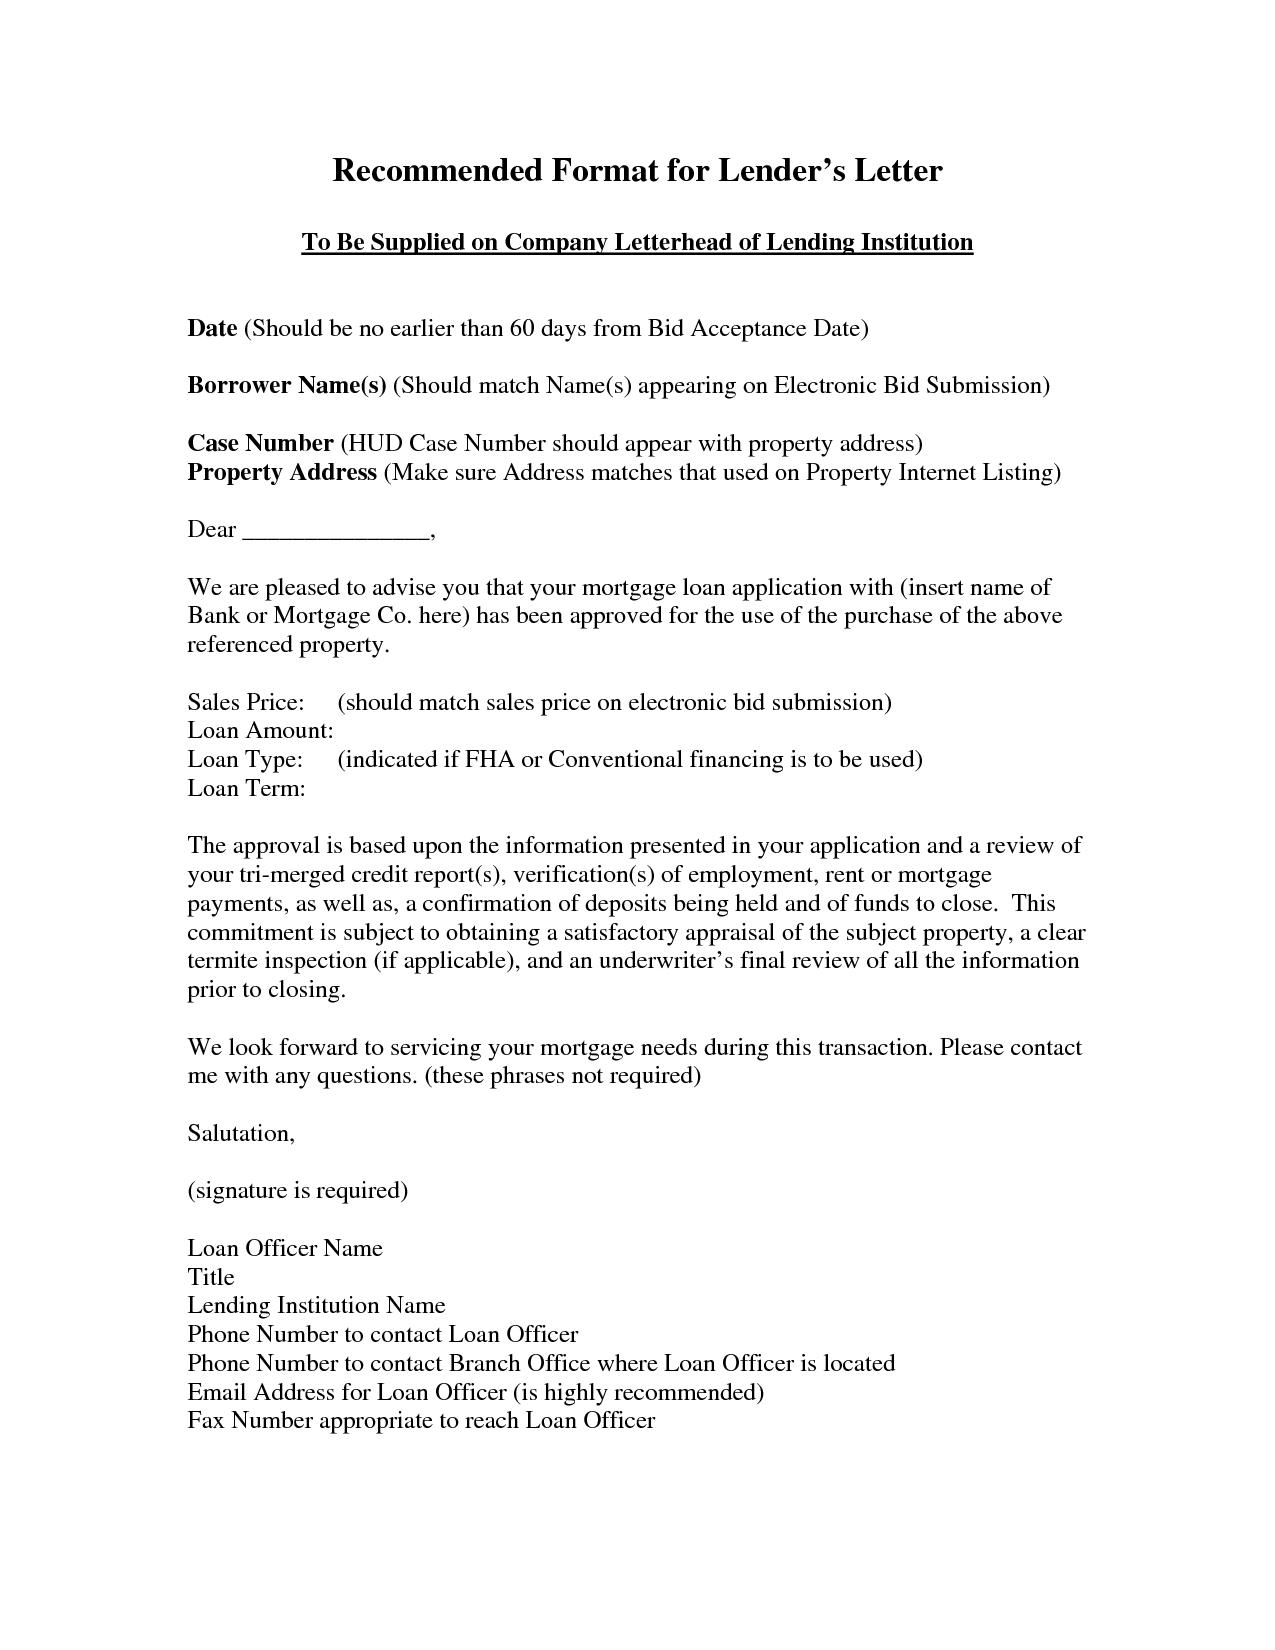 Loan Application Letter Loan application letter is